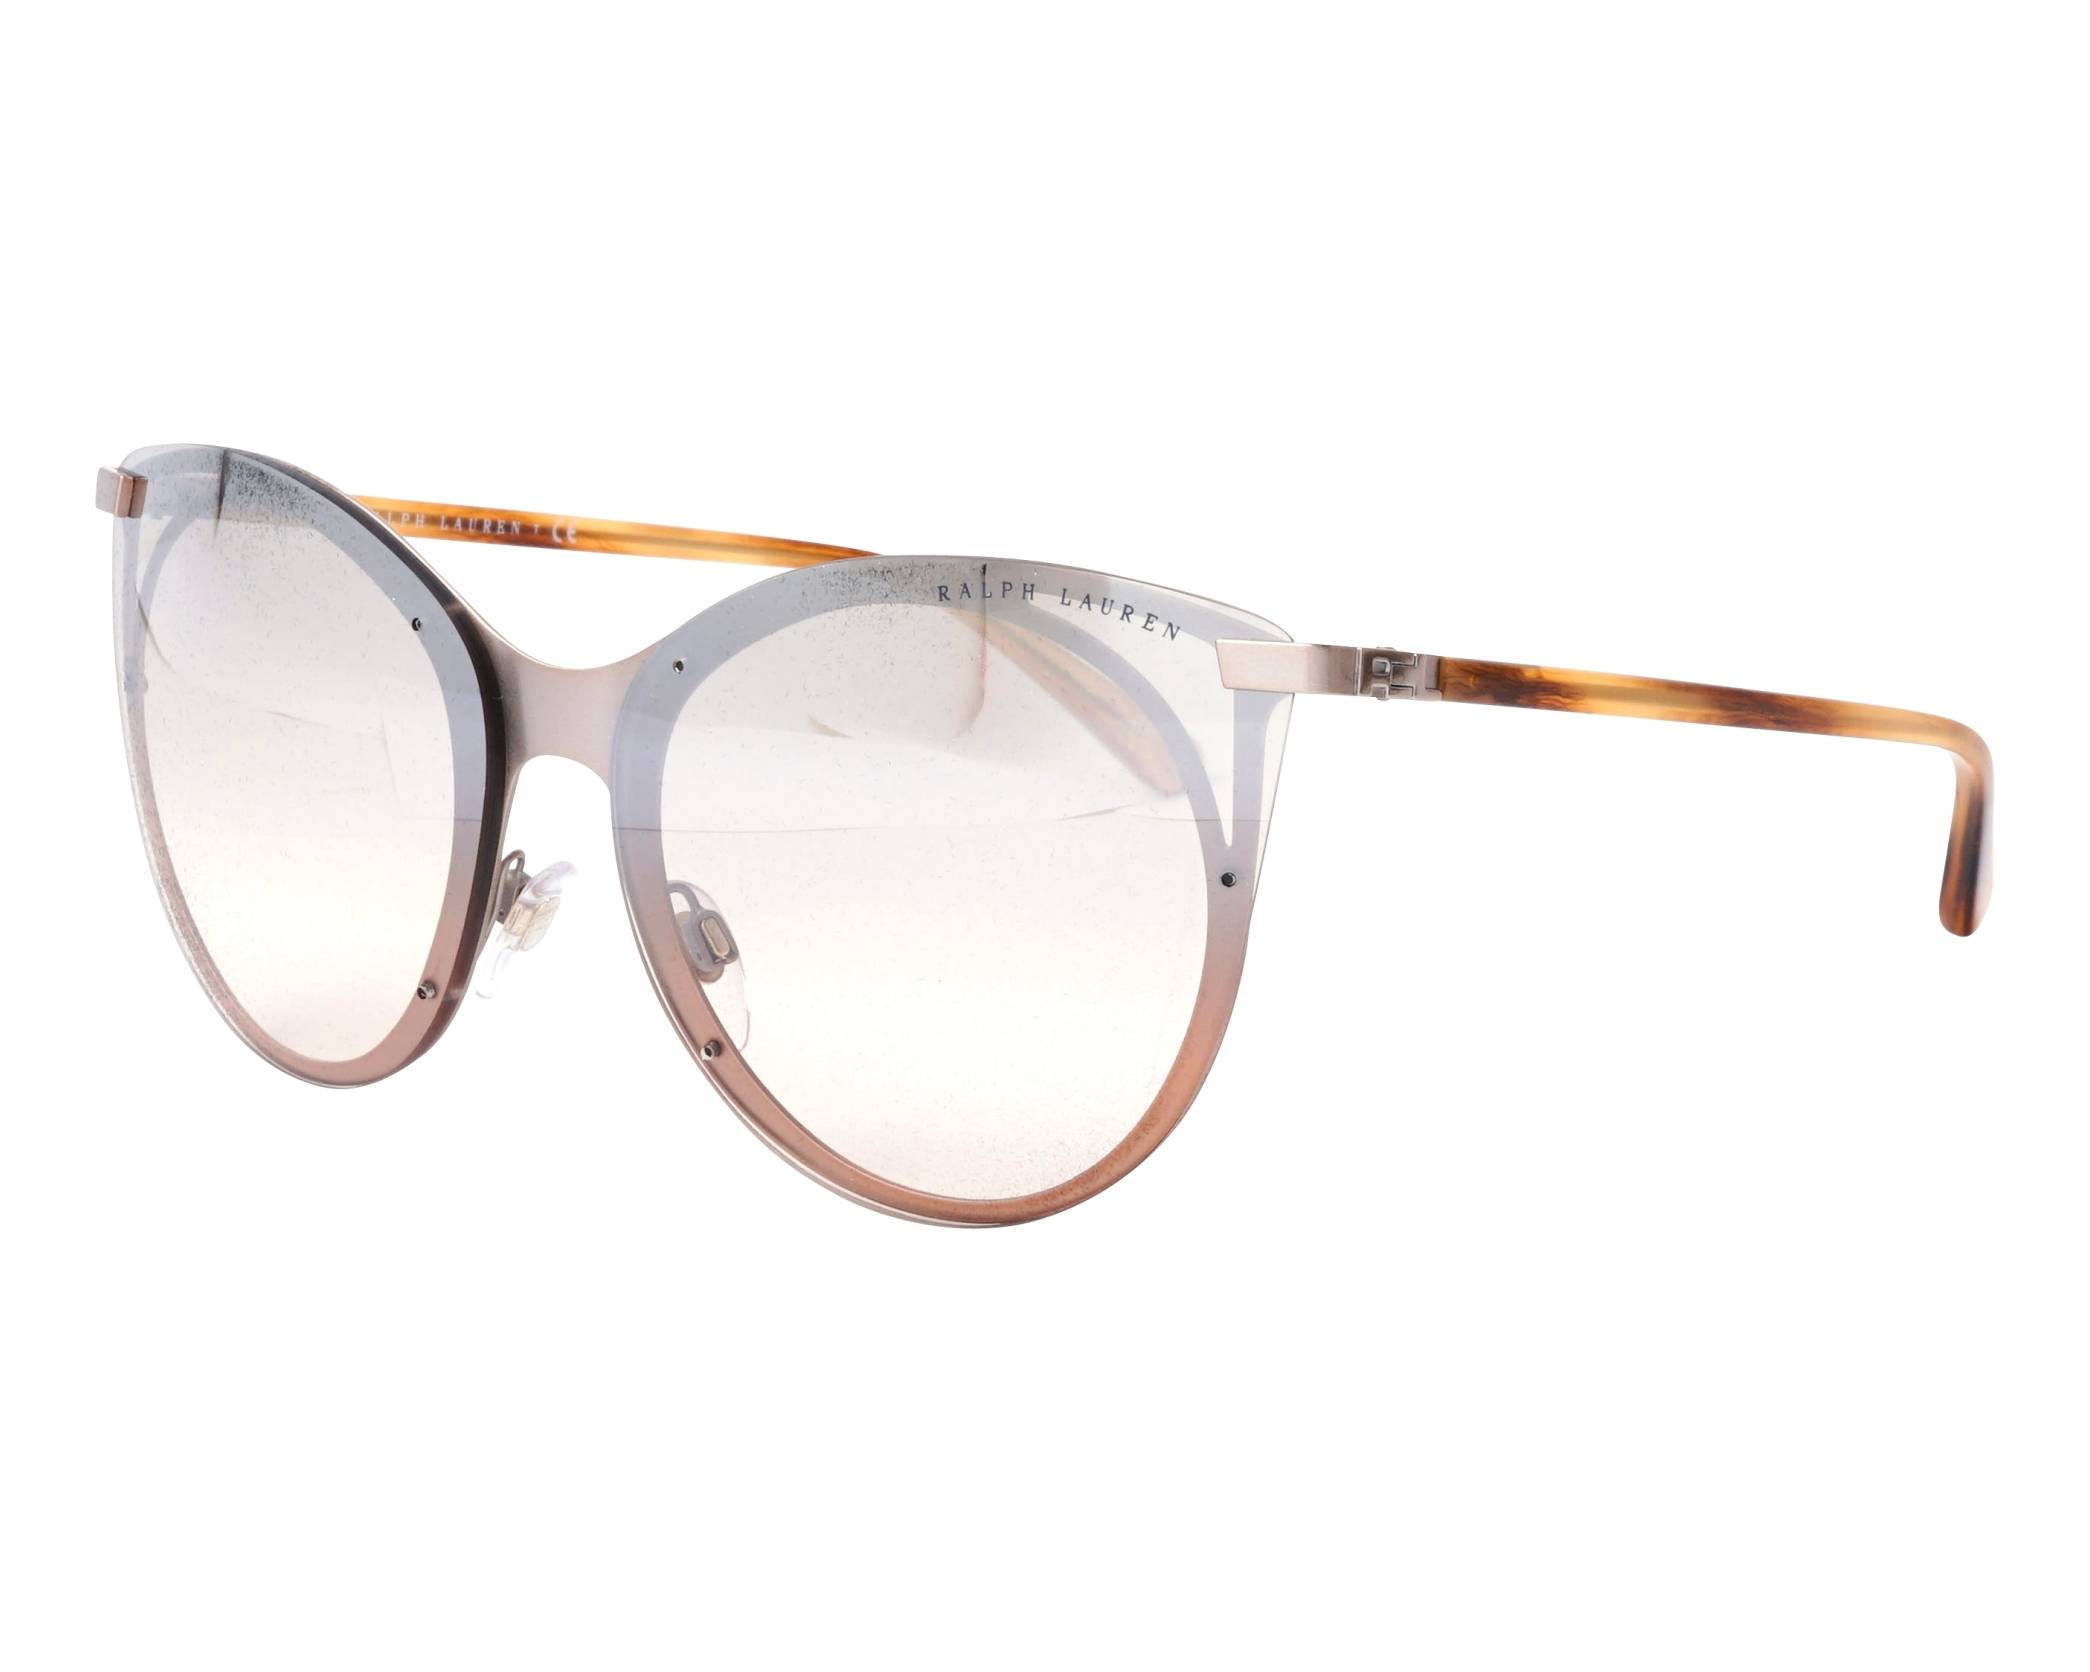 91a3a2a9f39e Sunglasses Ralph Lauren RL-7059 90948Z 63-14 Silver Brown profile view